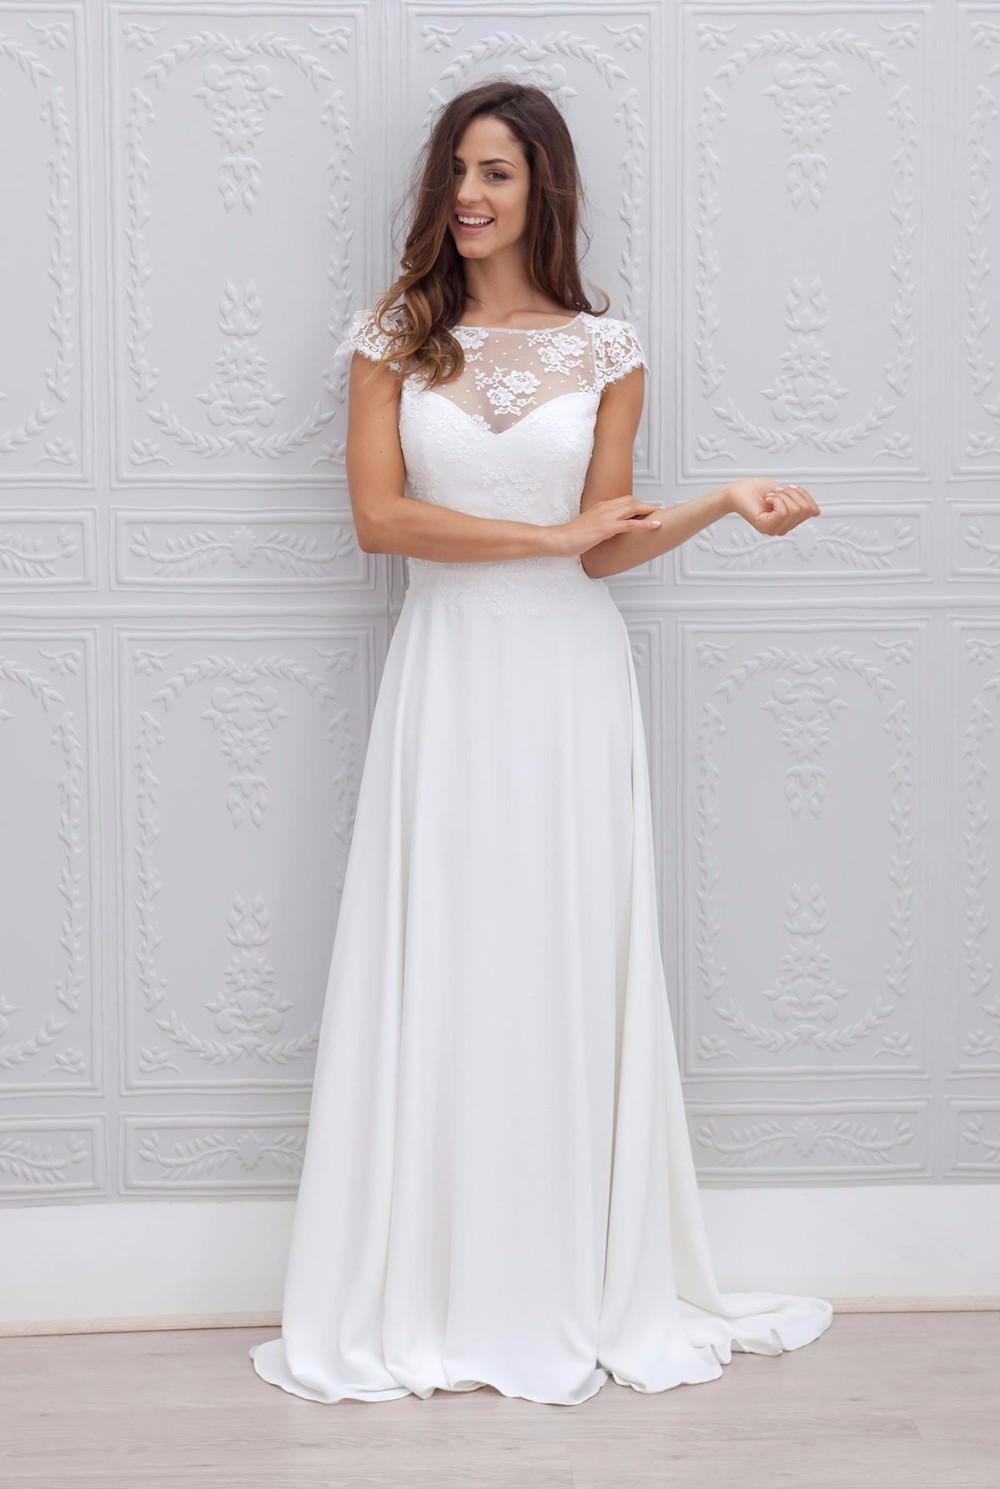 2017 A line Bateau Appliqued vestido de noiva de renda White Long Vintage Bride Dresses With Short Sleeve Beach Wedding Dress 2